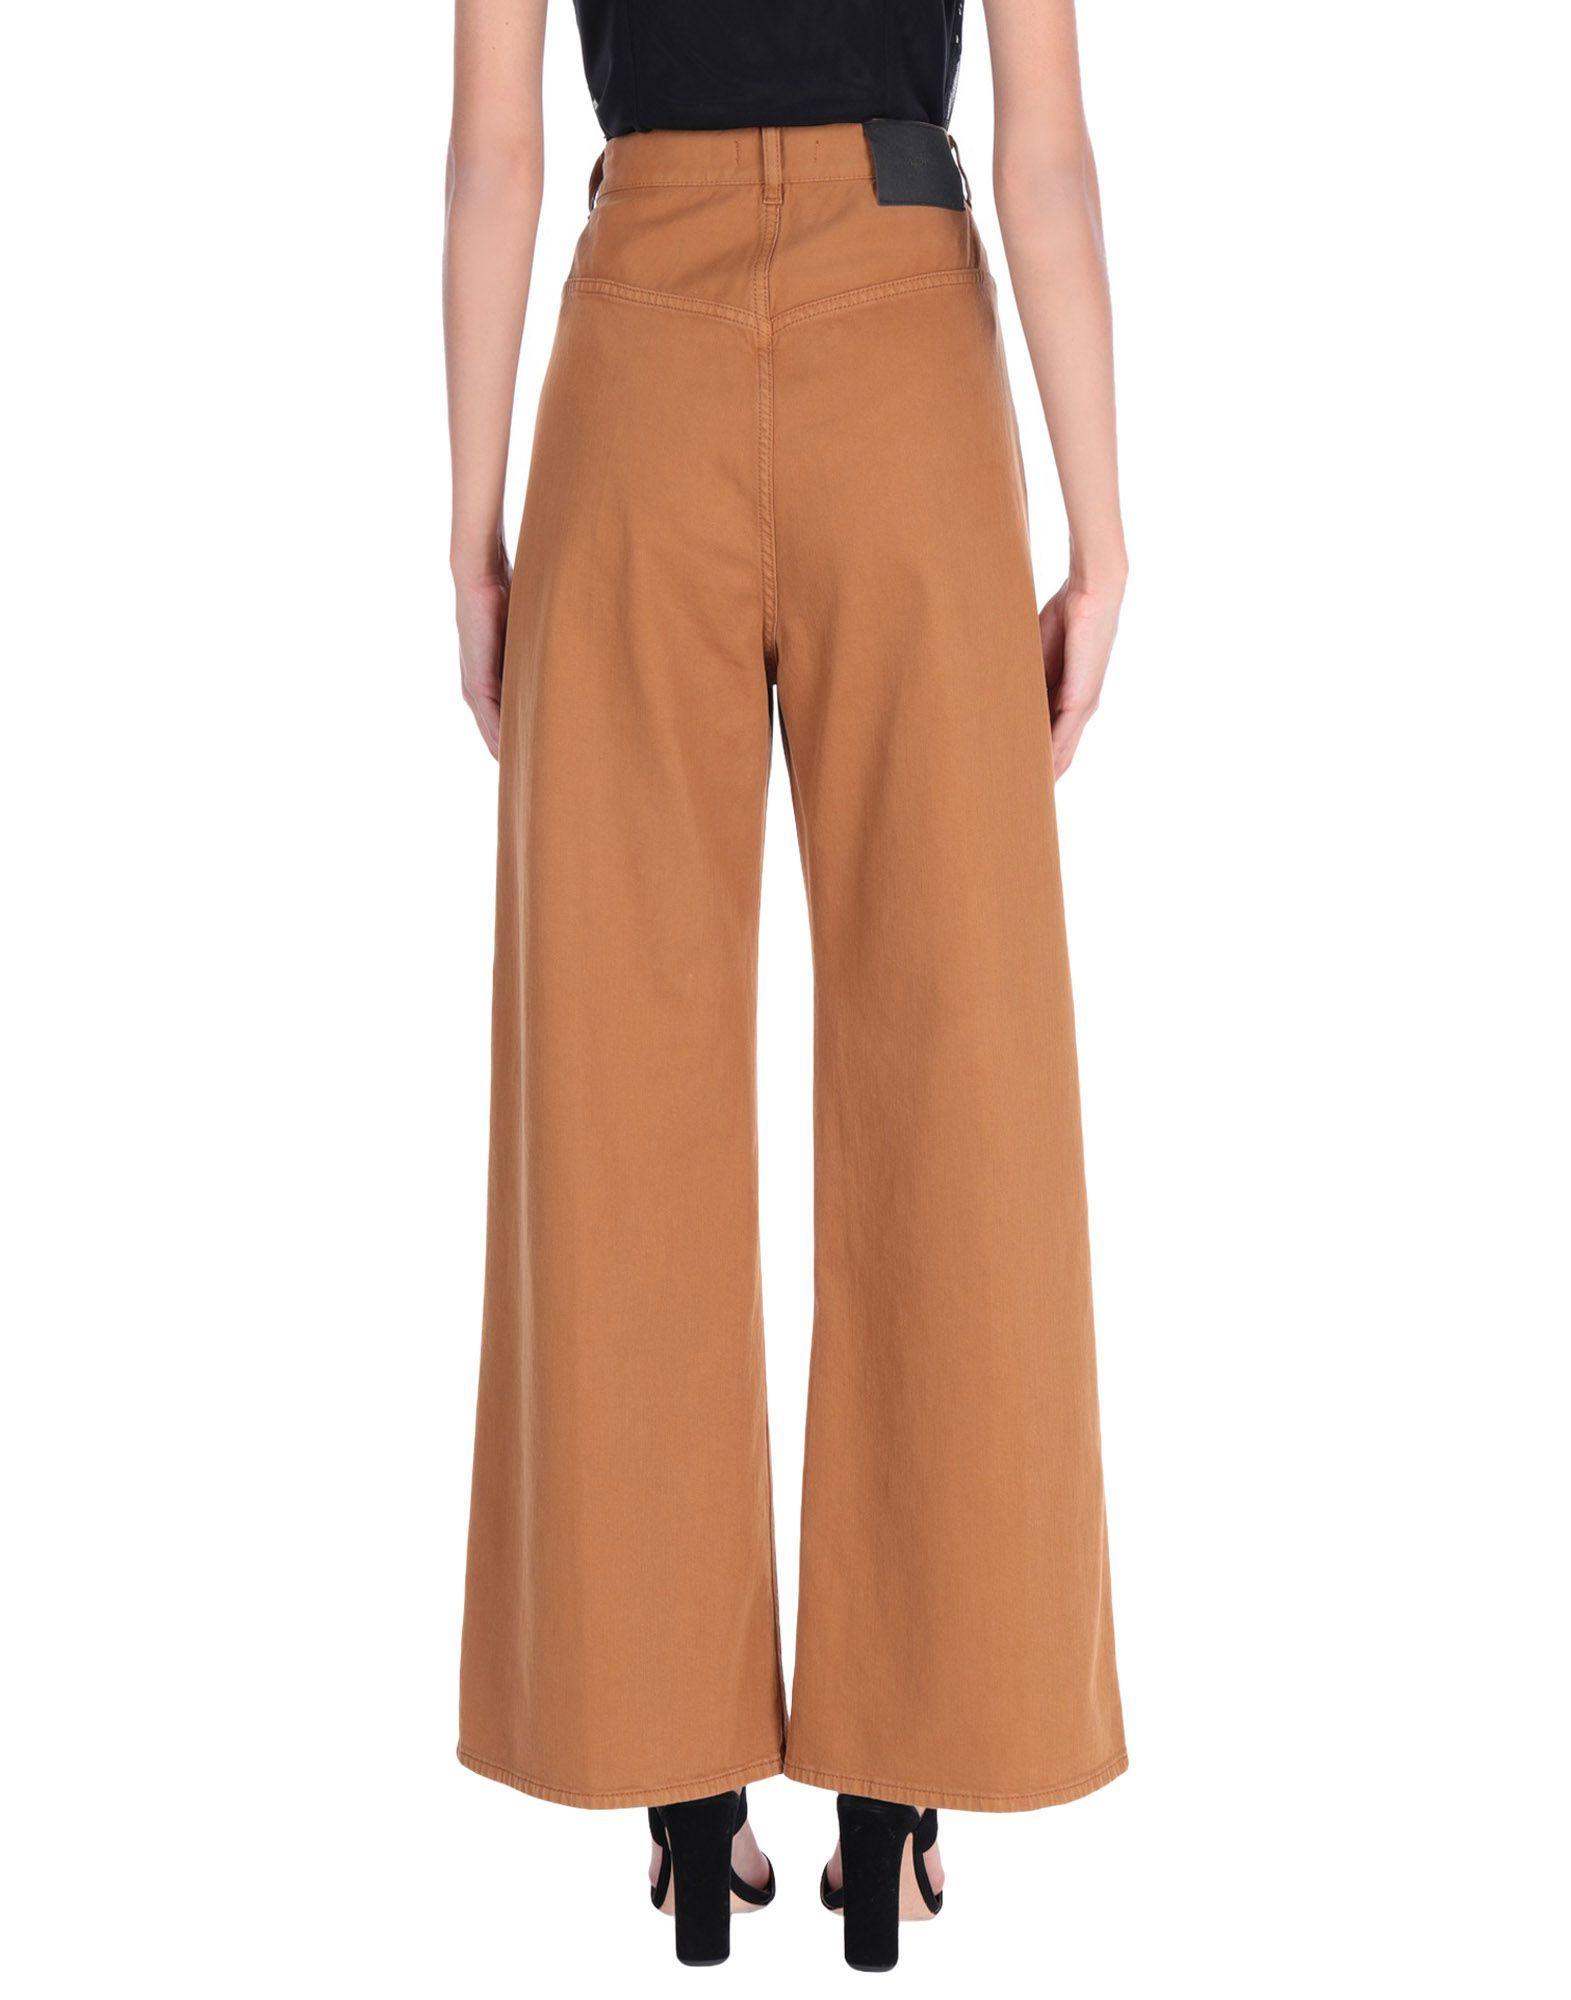 Mauro Grifoni Brown Cotton Wide Leg Jeans